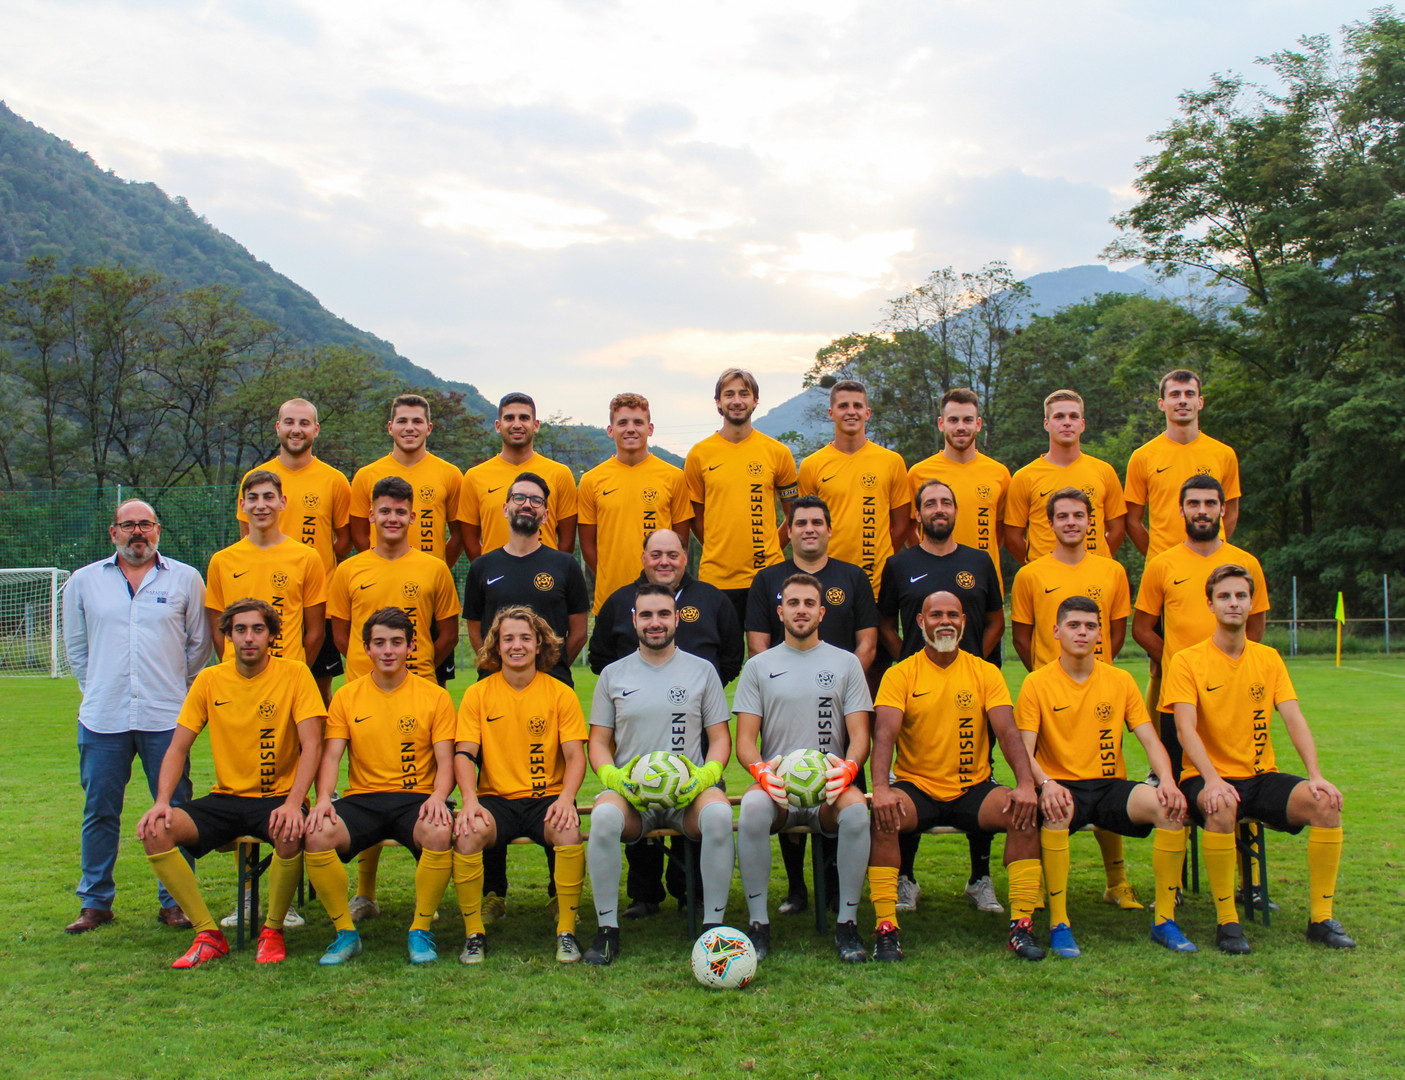 Prima squadra USV stagione 20/21